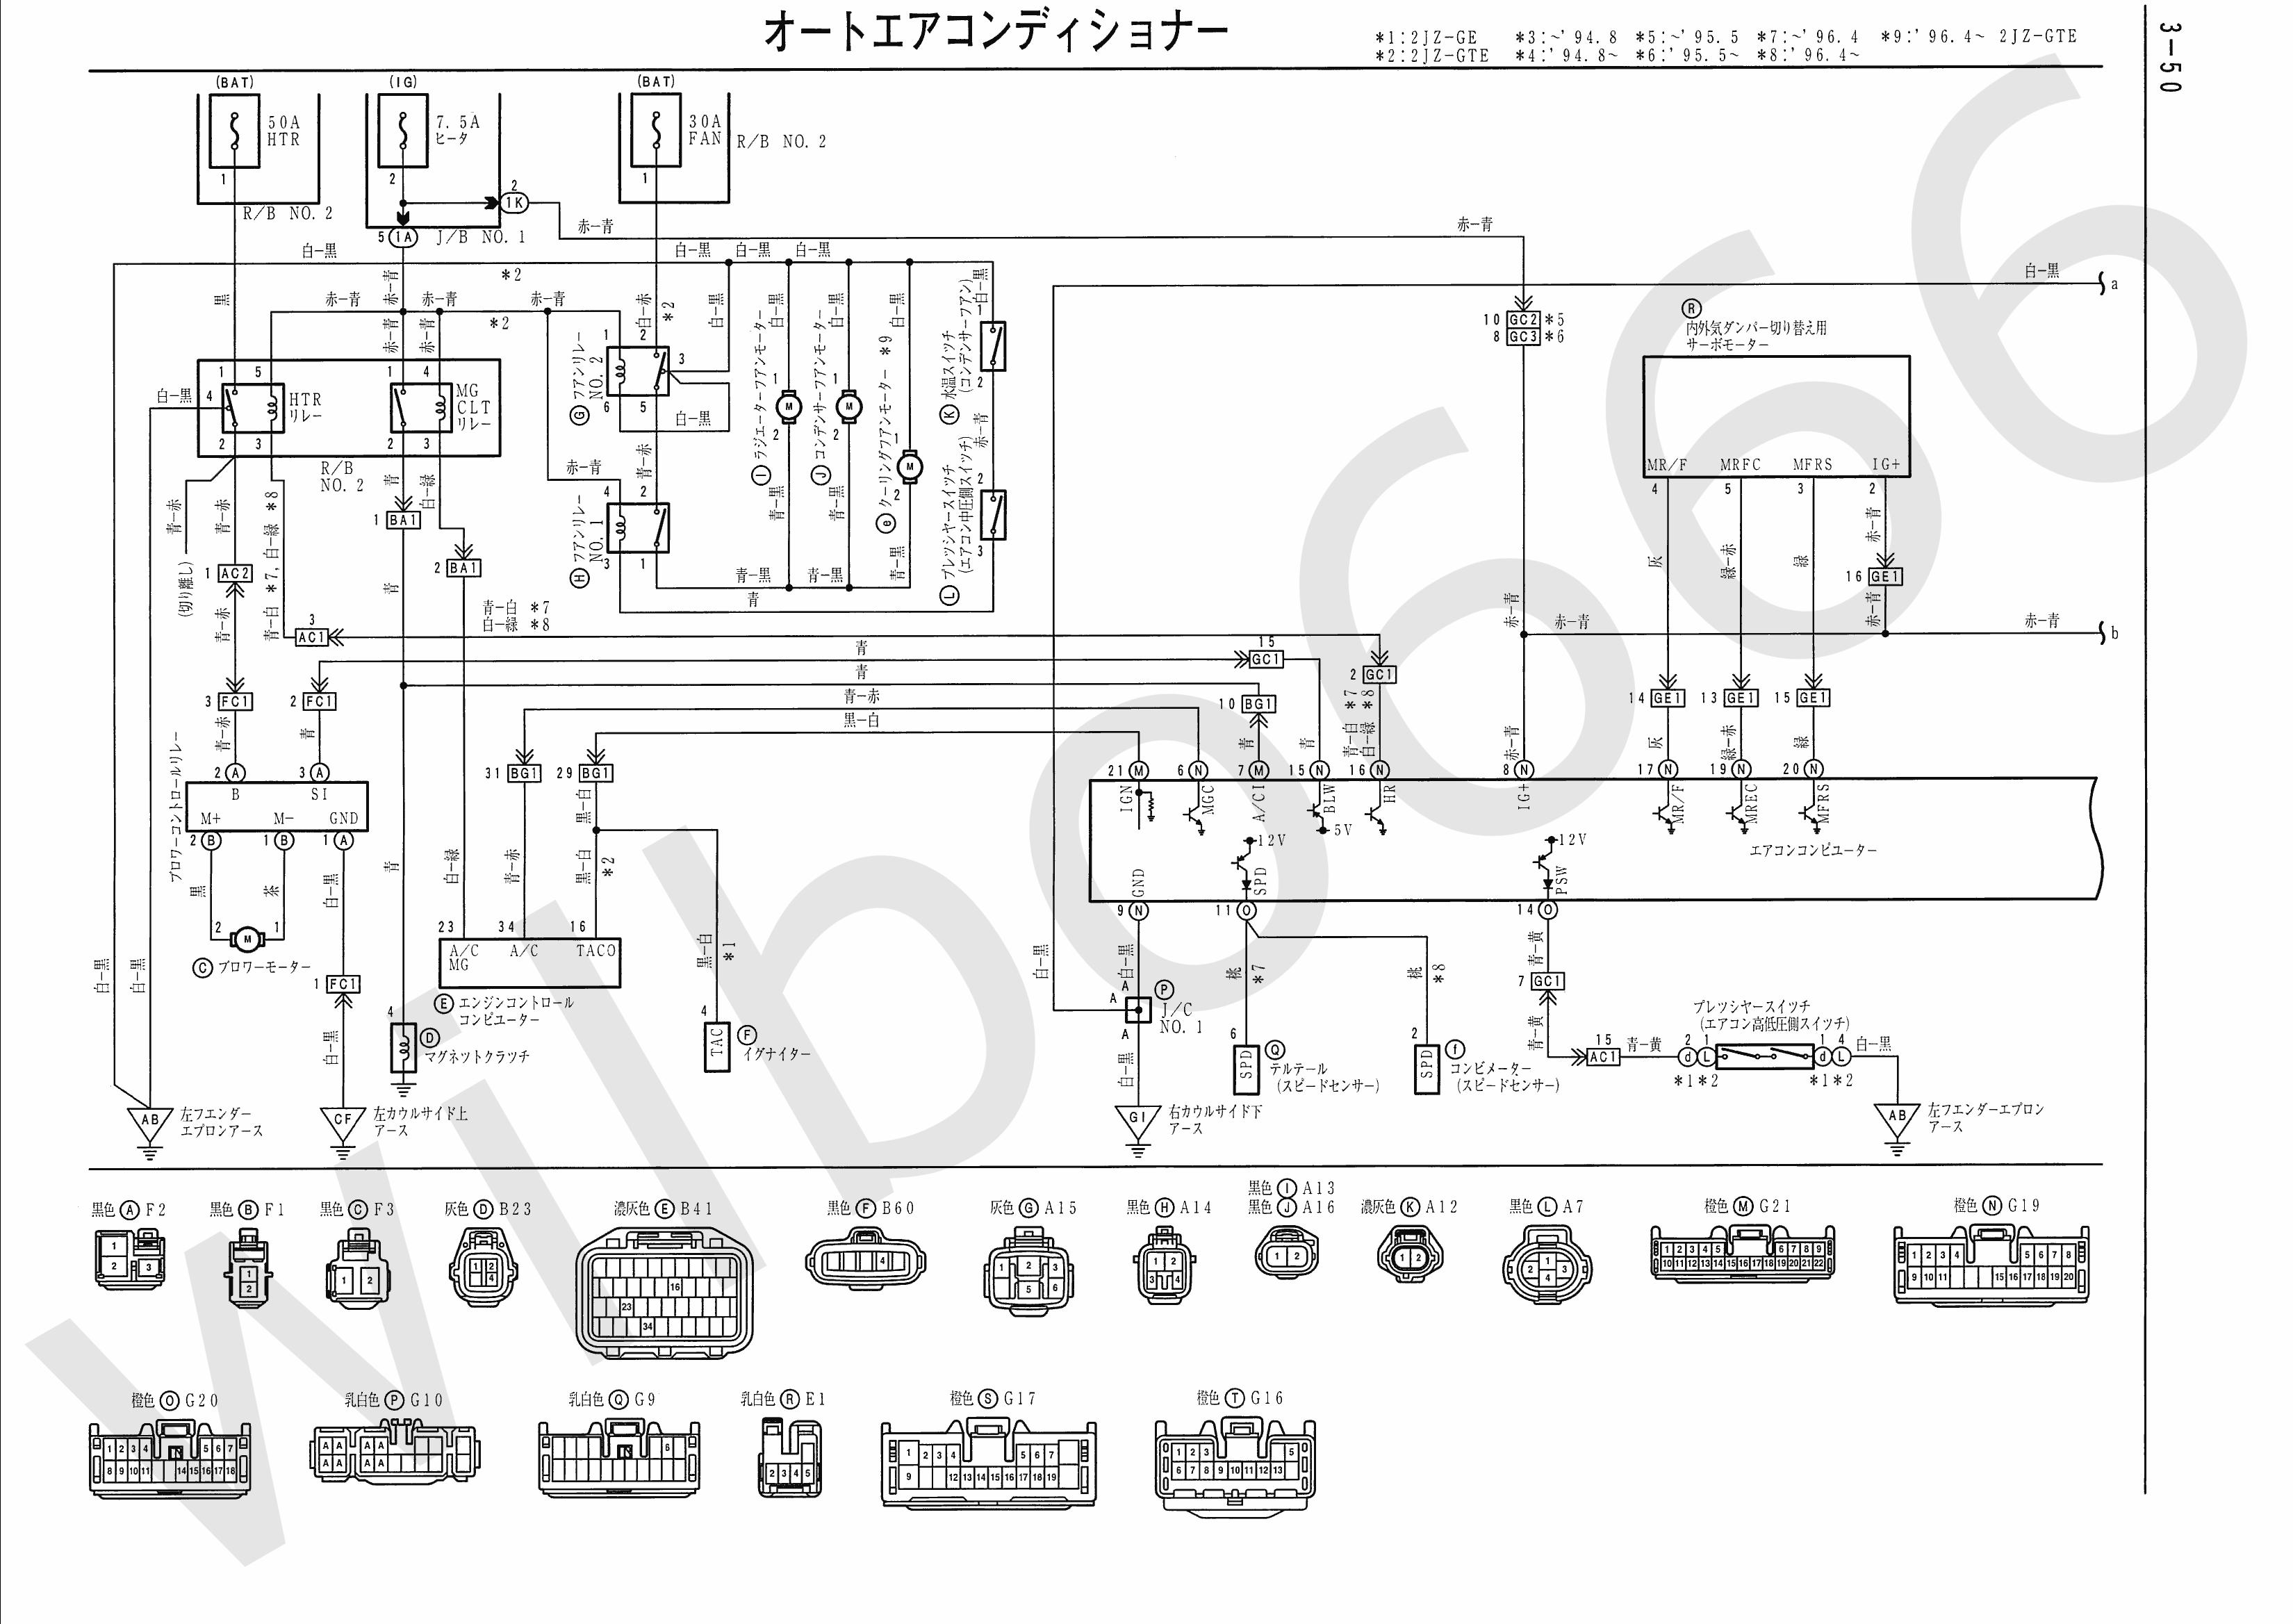 new electrician diagram  diagram  wiringdiagram  diagramming  diagramm  visuals  visualisation